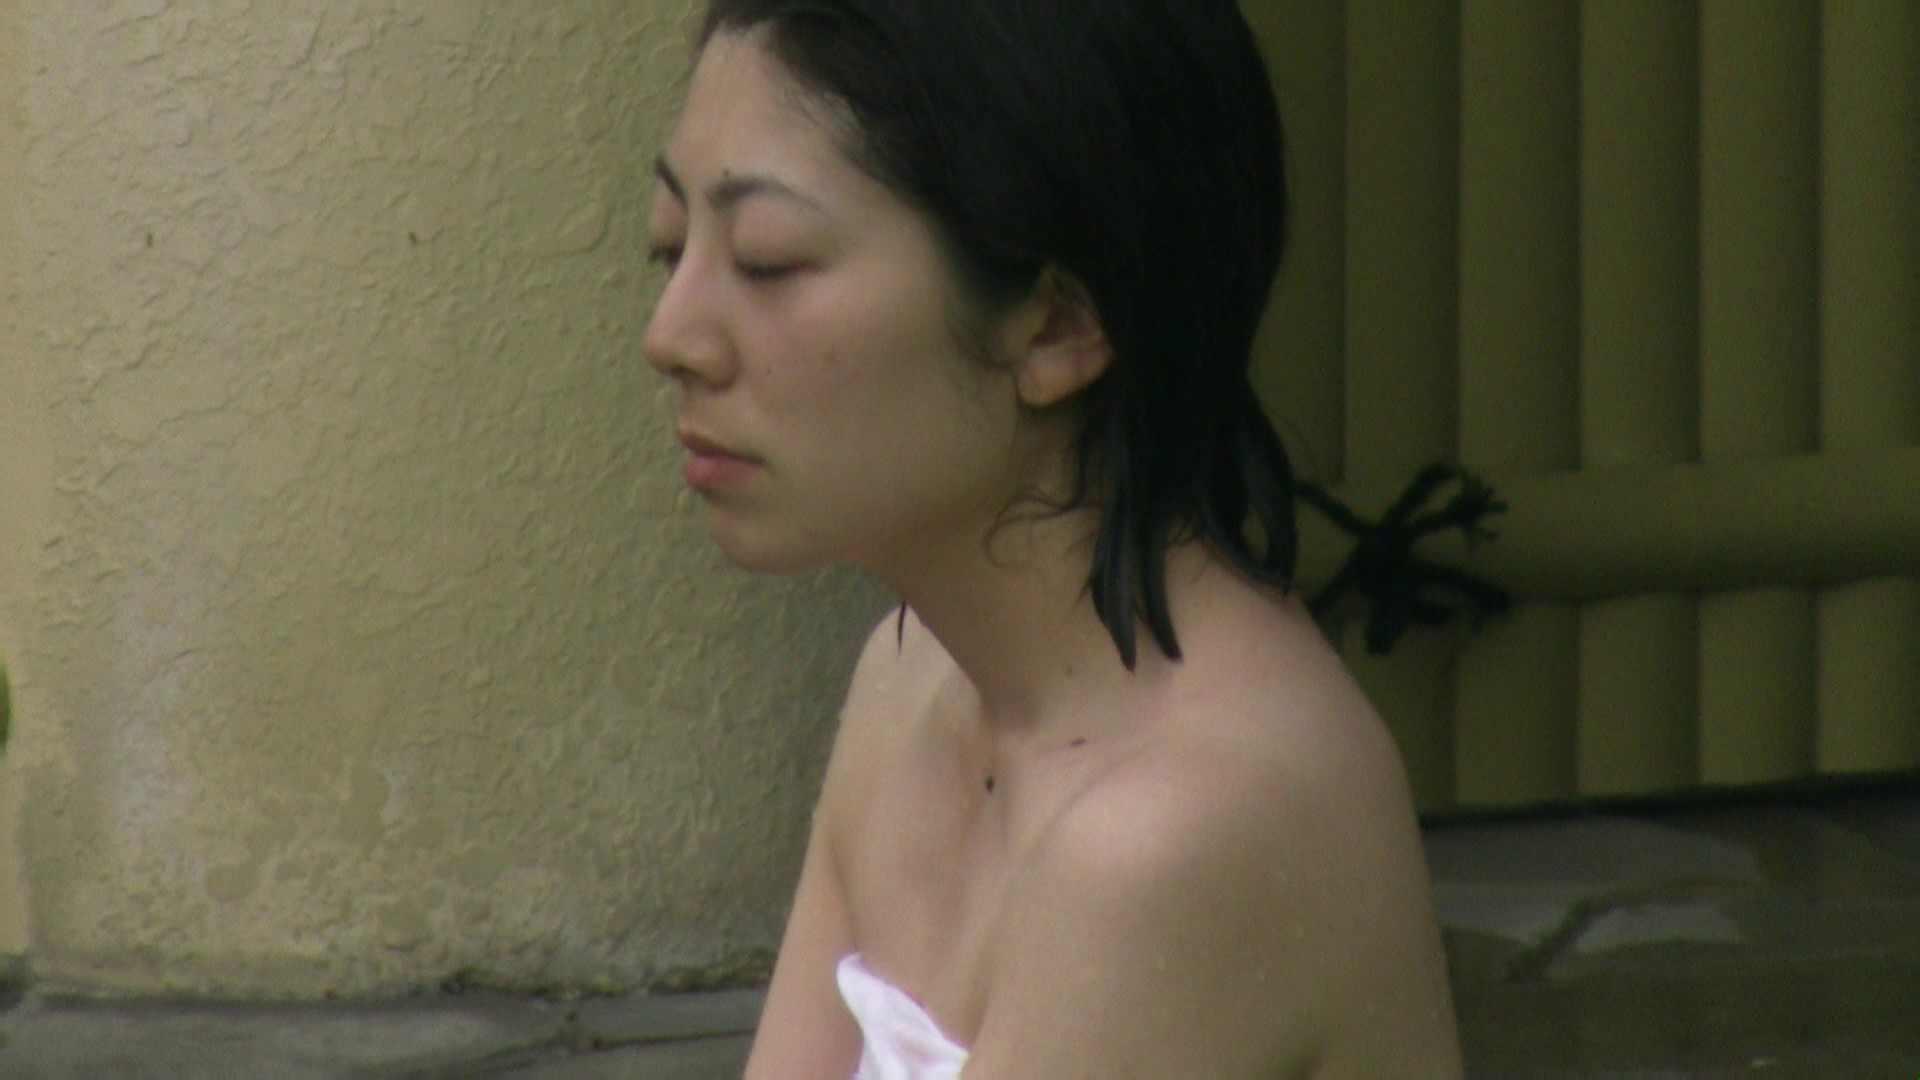 Aquaな露天風呂Vol.04 露天風呂編 | 盗撮シリーズ  94PIX 41